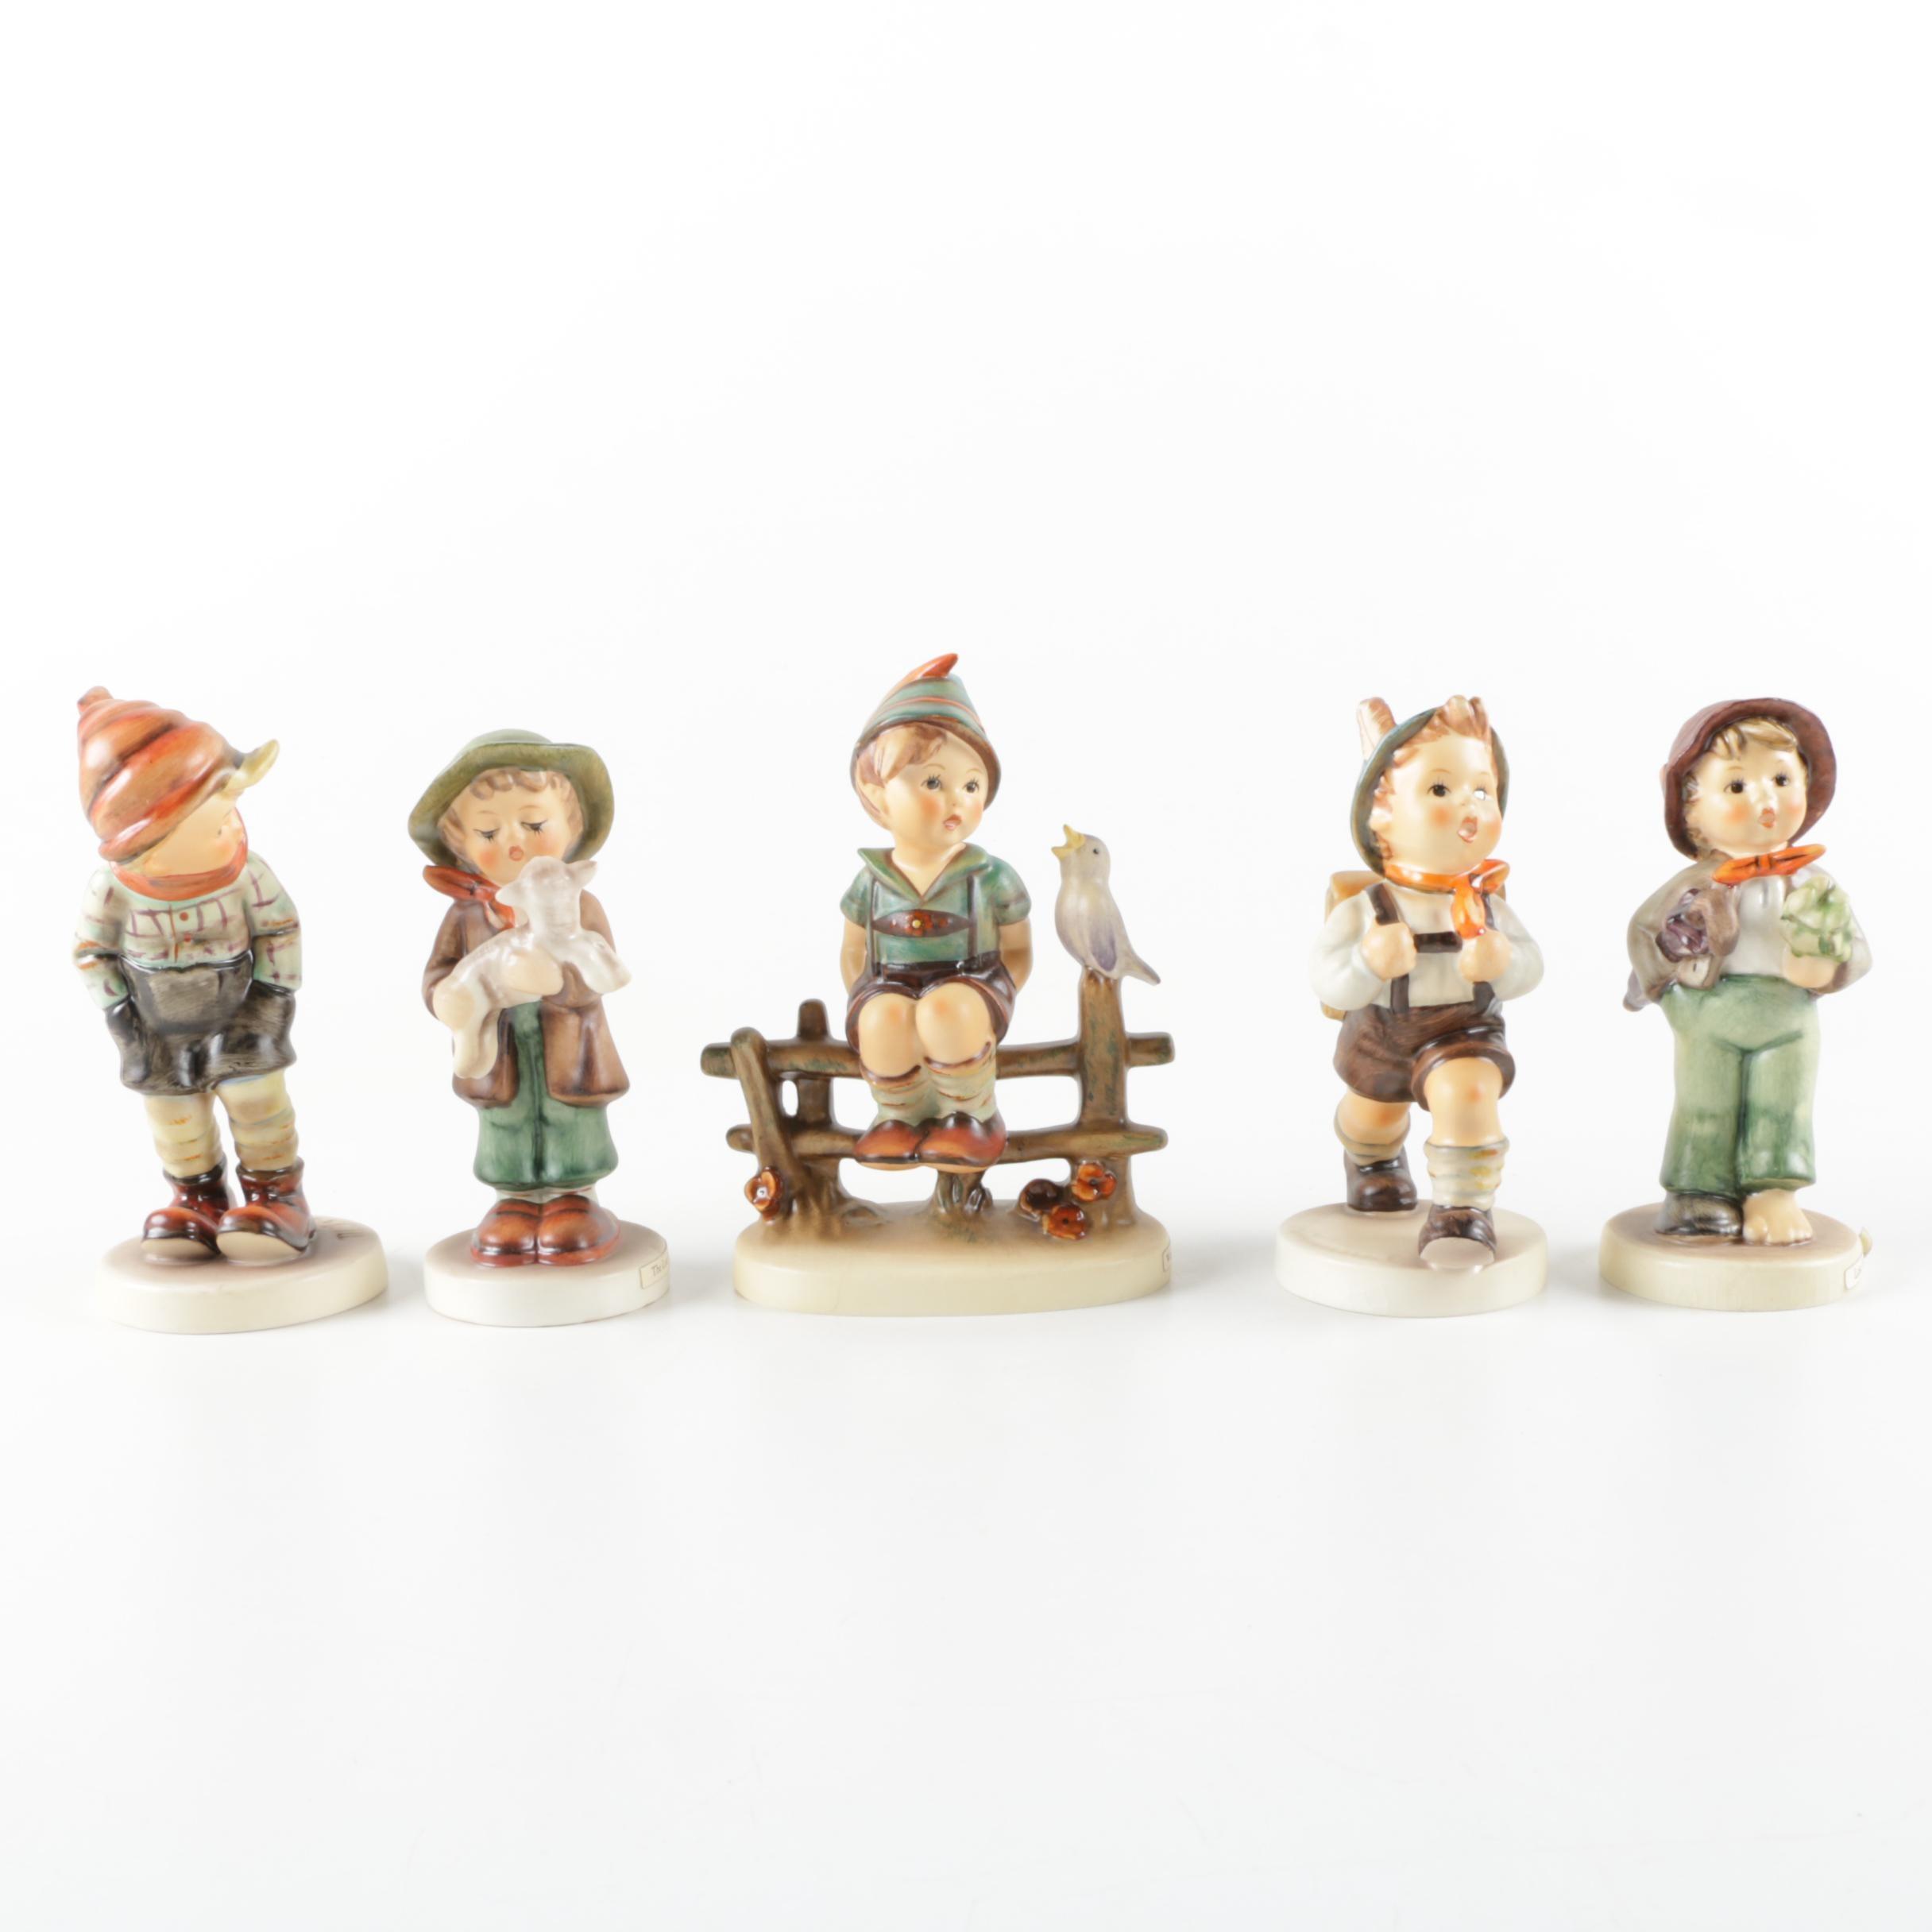 Assortment of Goebel Hummel Figurines